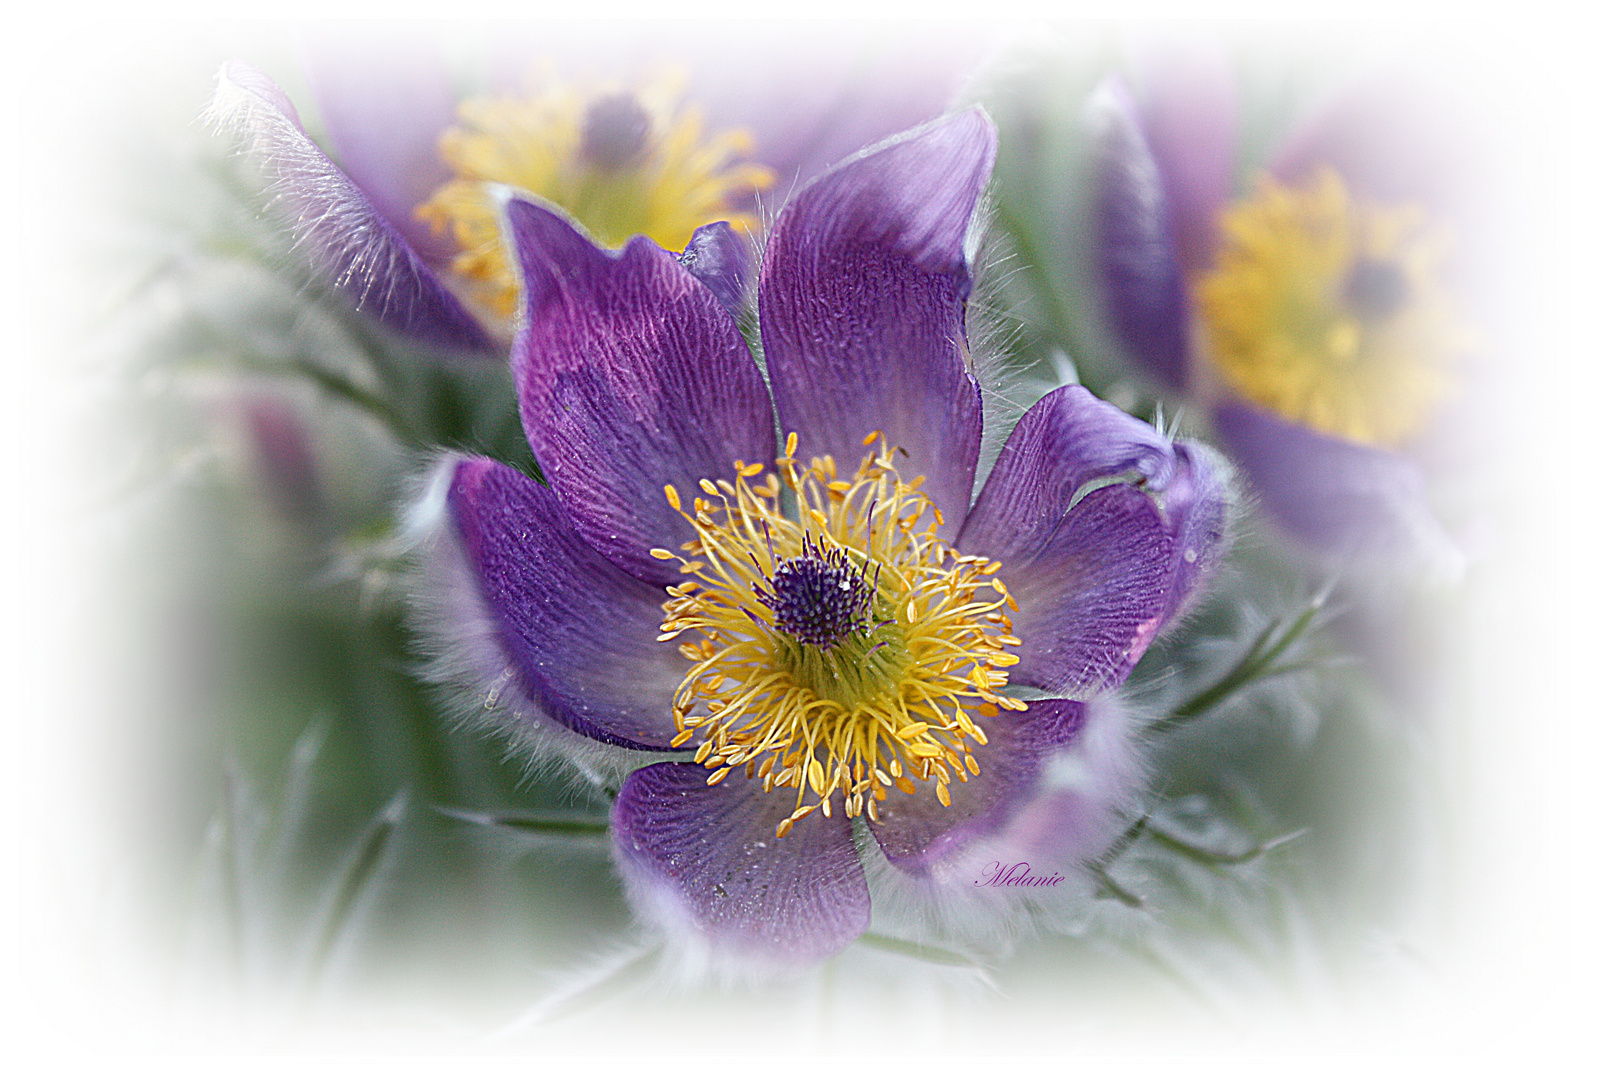 Lila Laune Blume